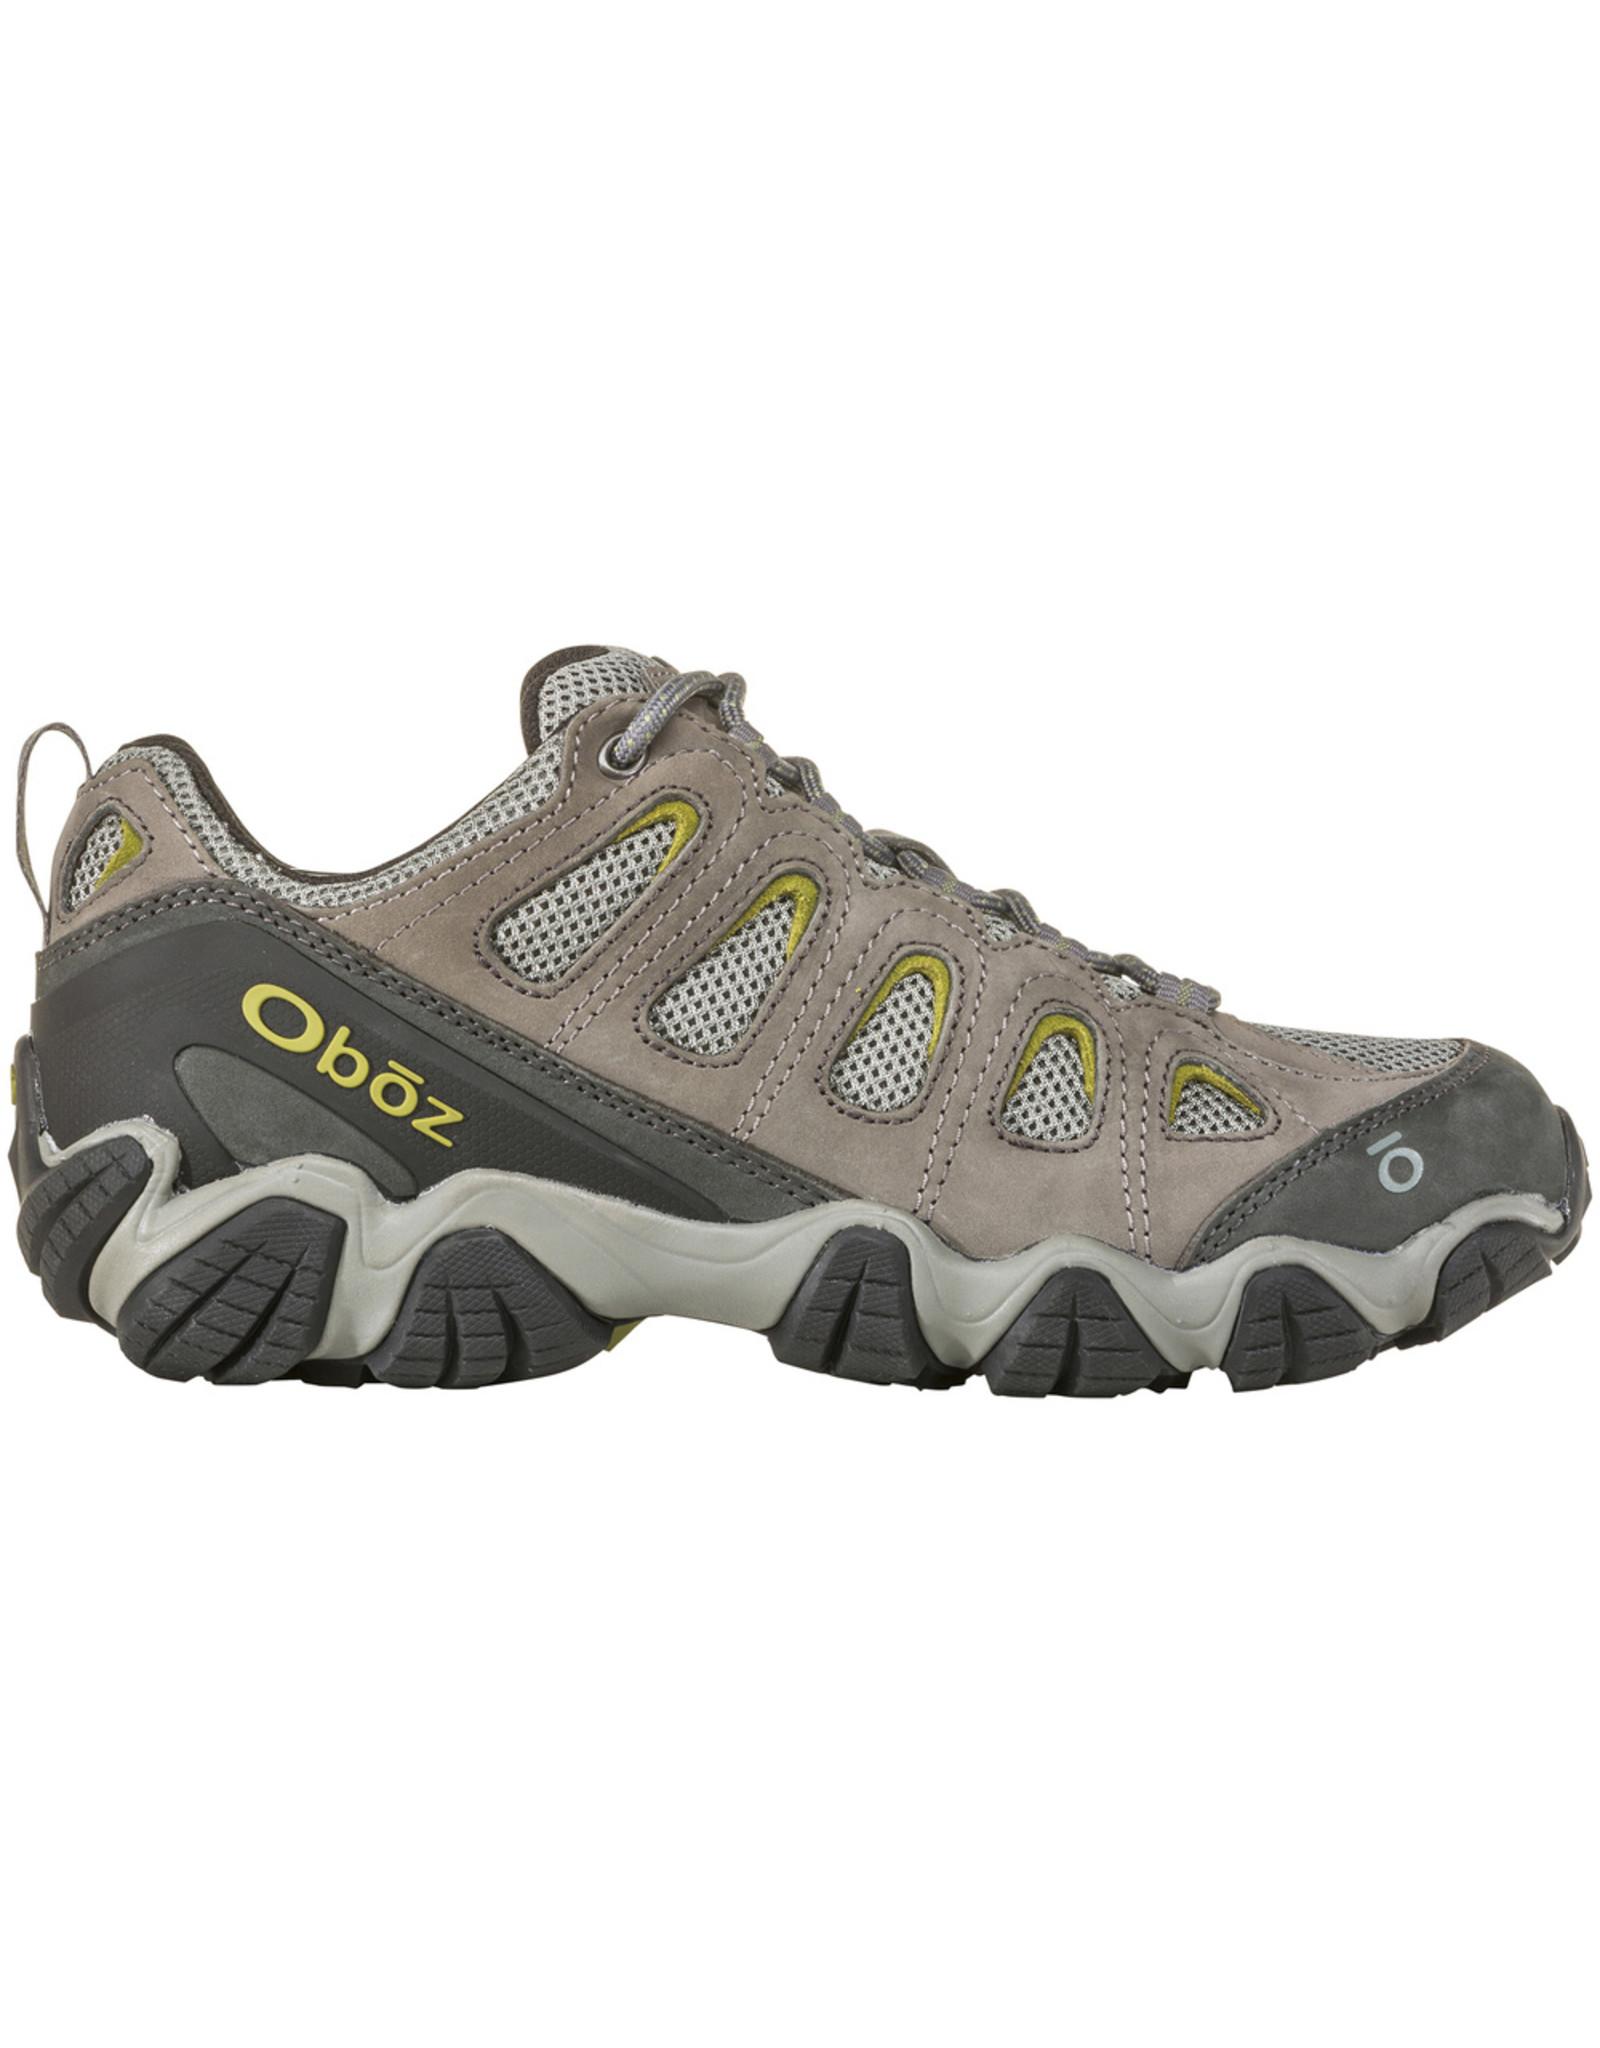 Oboz Sawtooth II Low Hiking Shoes - Men's